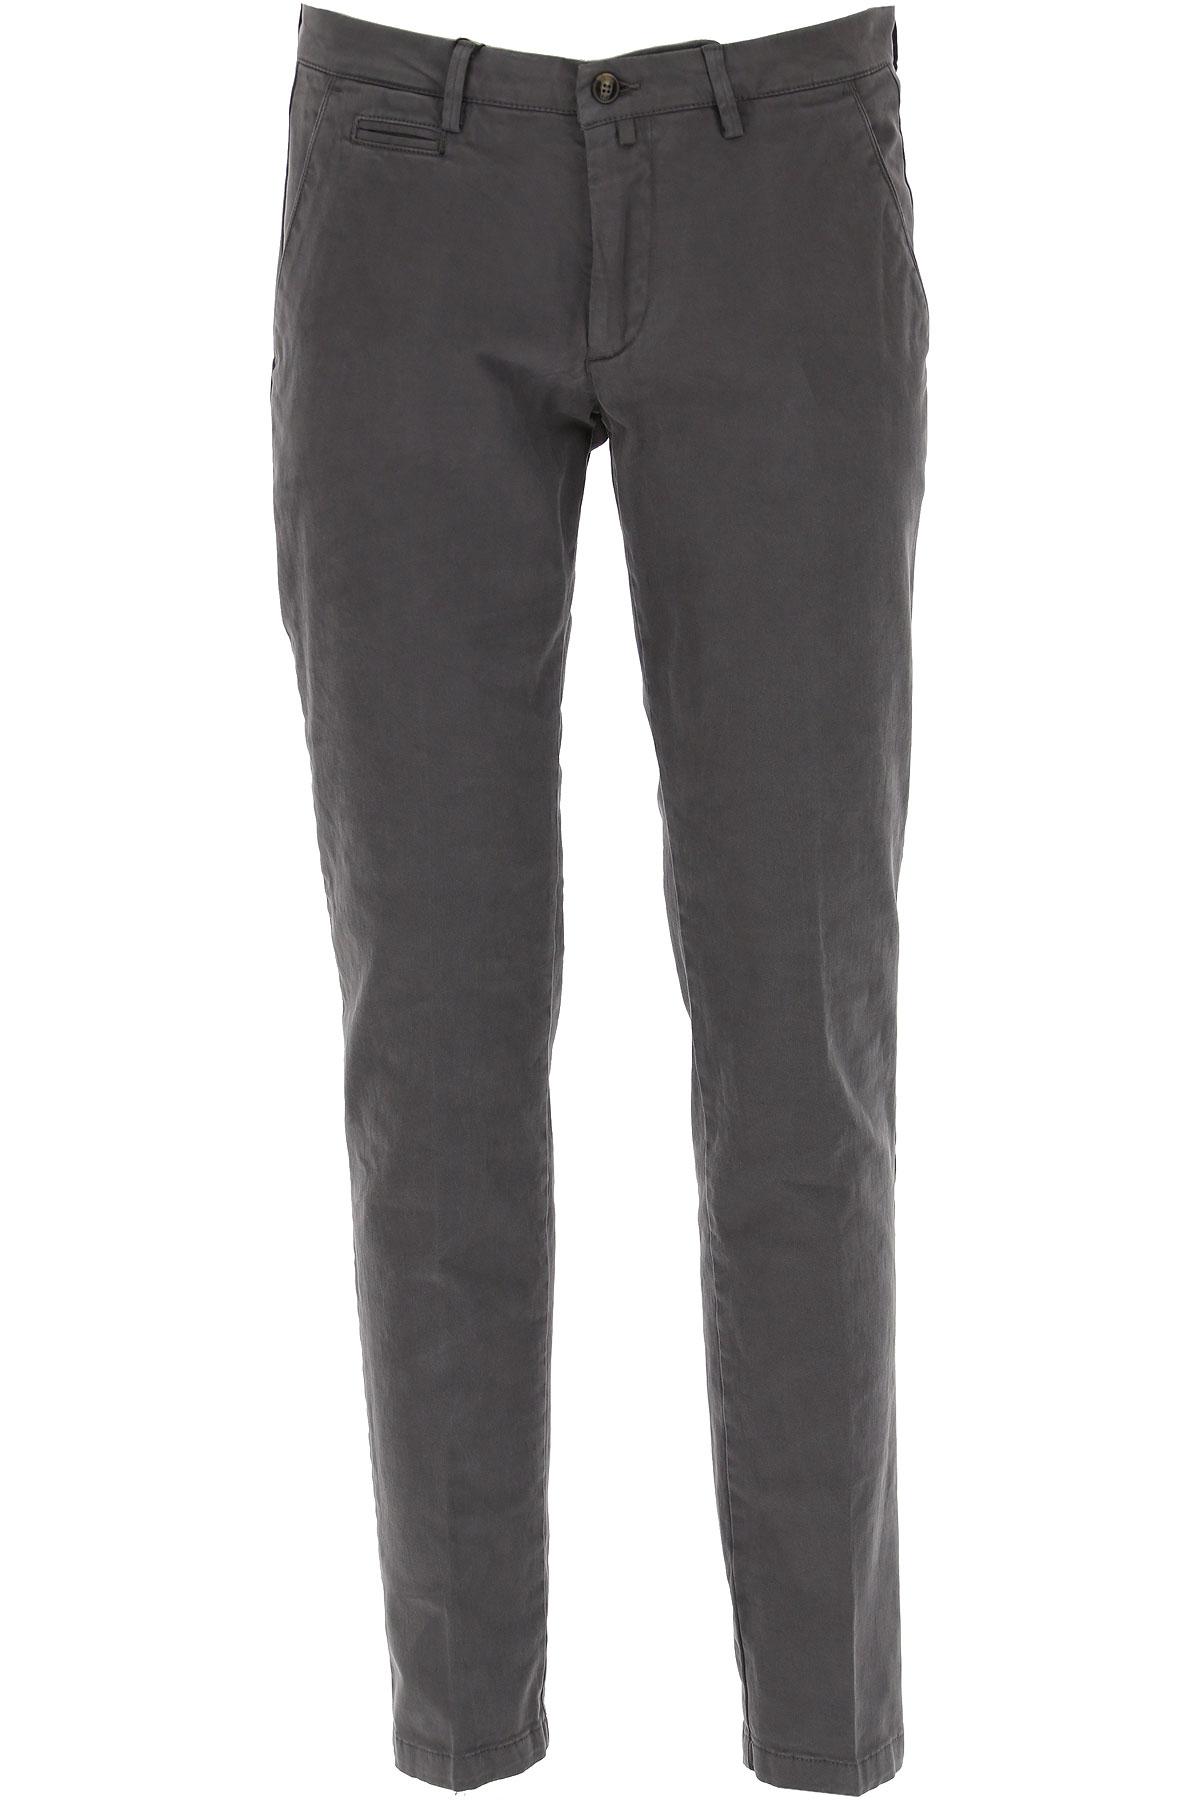 Briglia Pants for Men On Sale, Grey, Cotton, 2019, 34 36 40